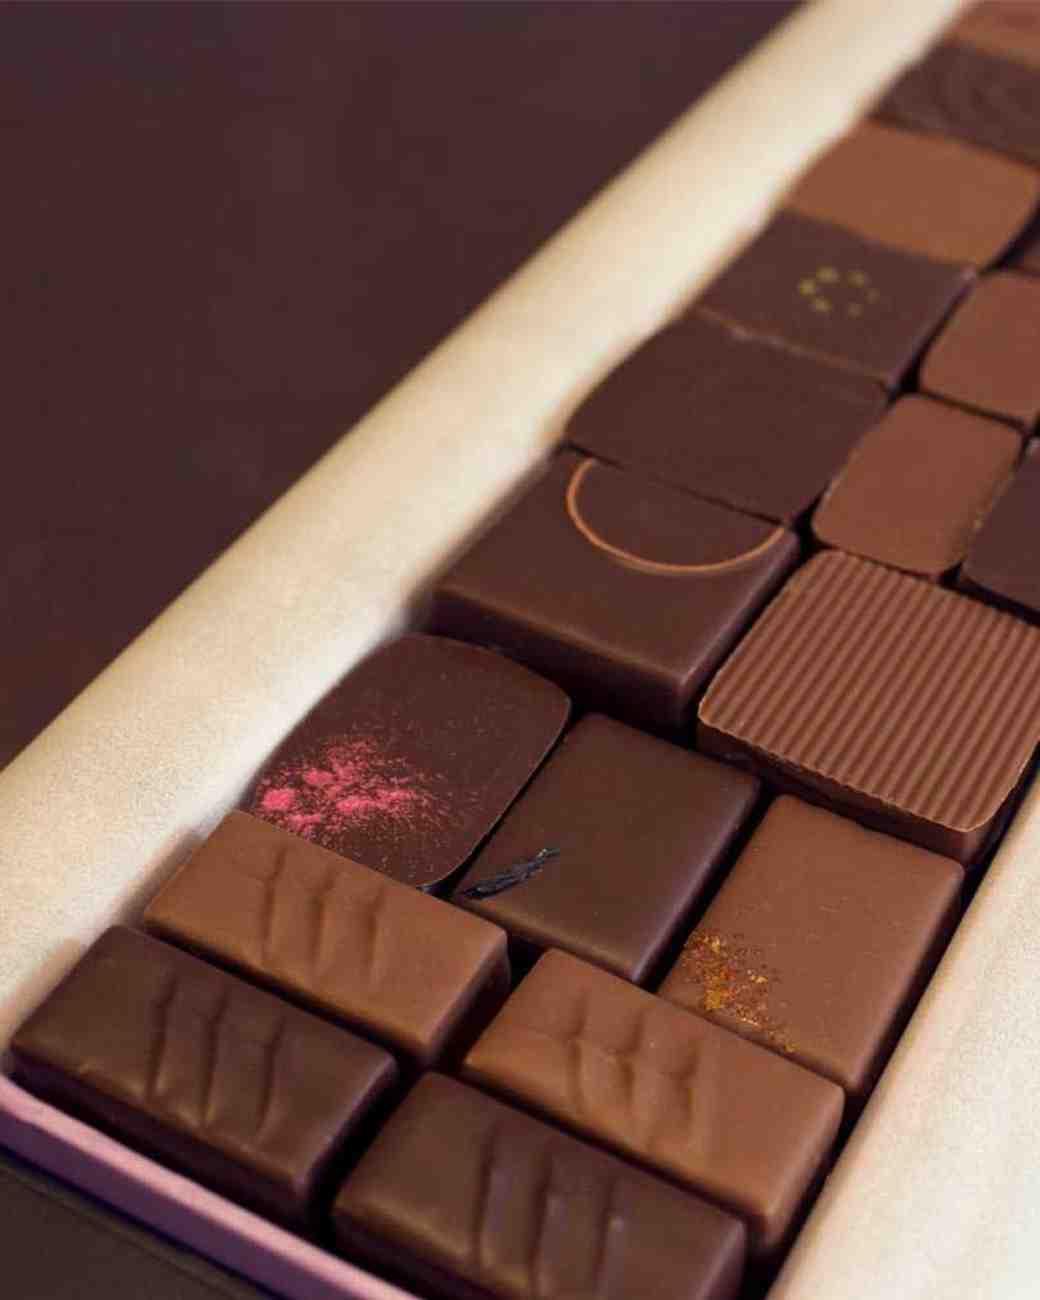 kreuther chocolate box